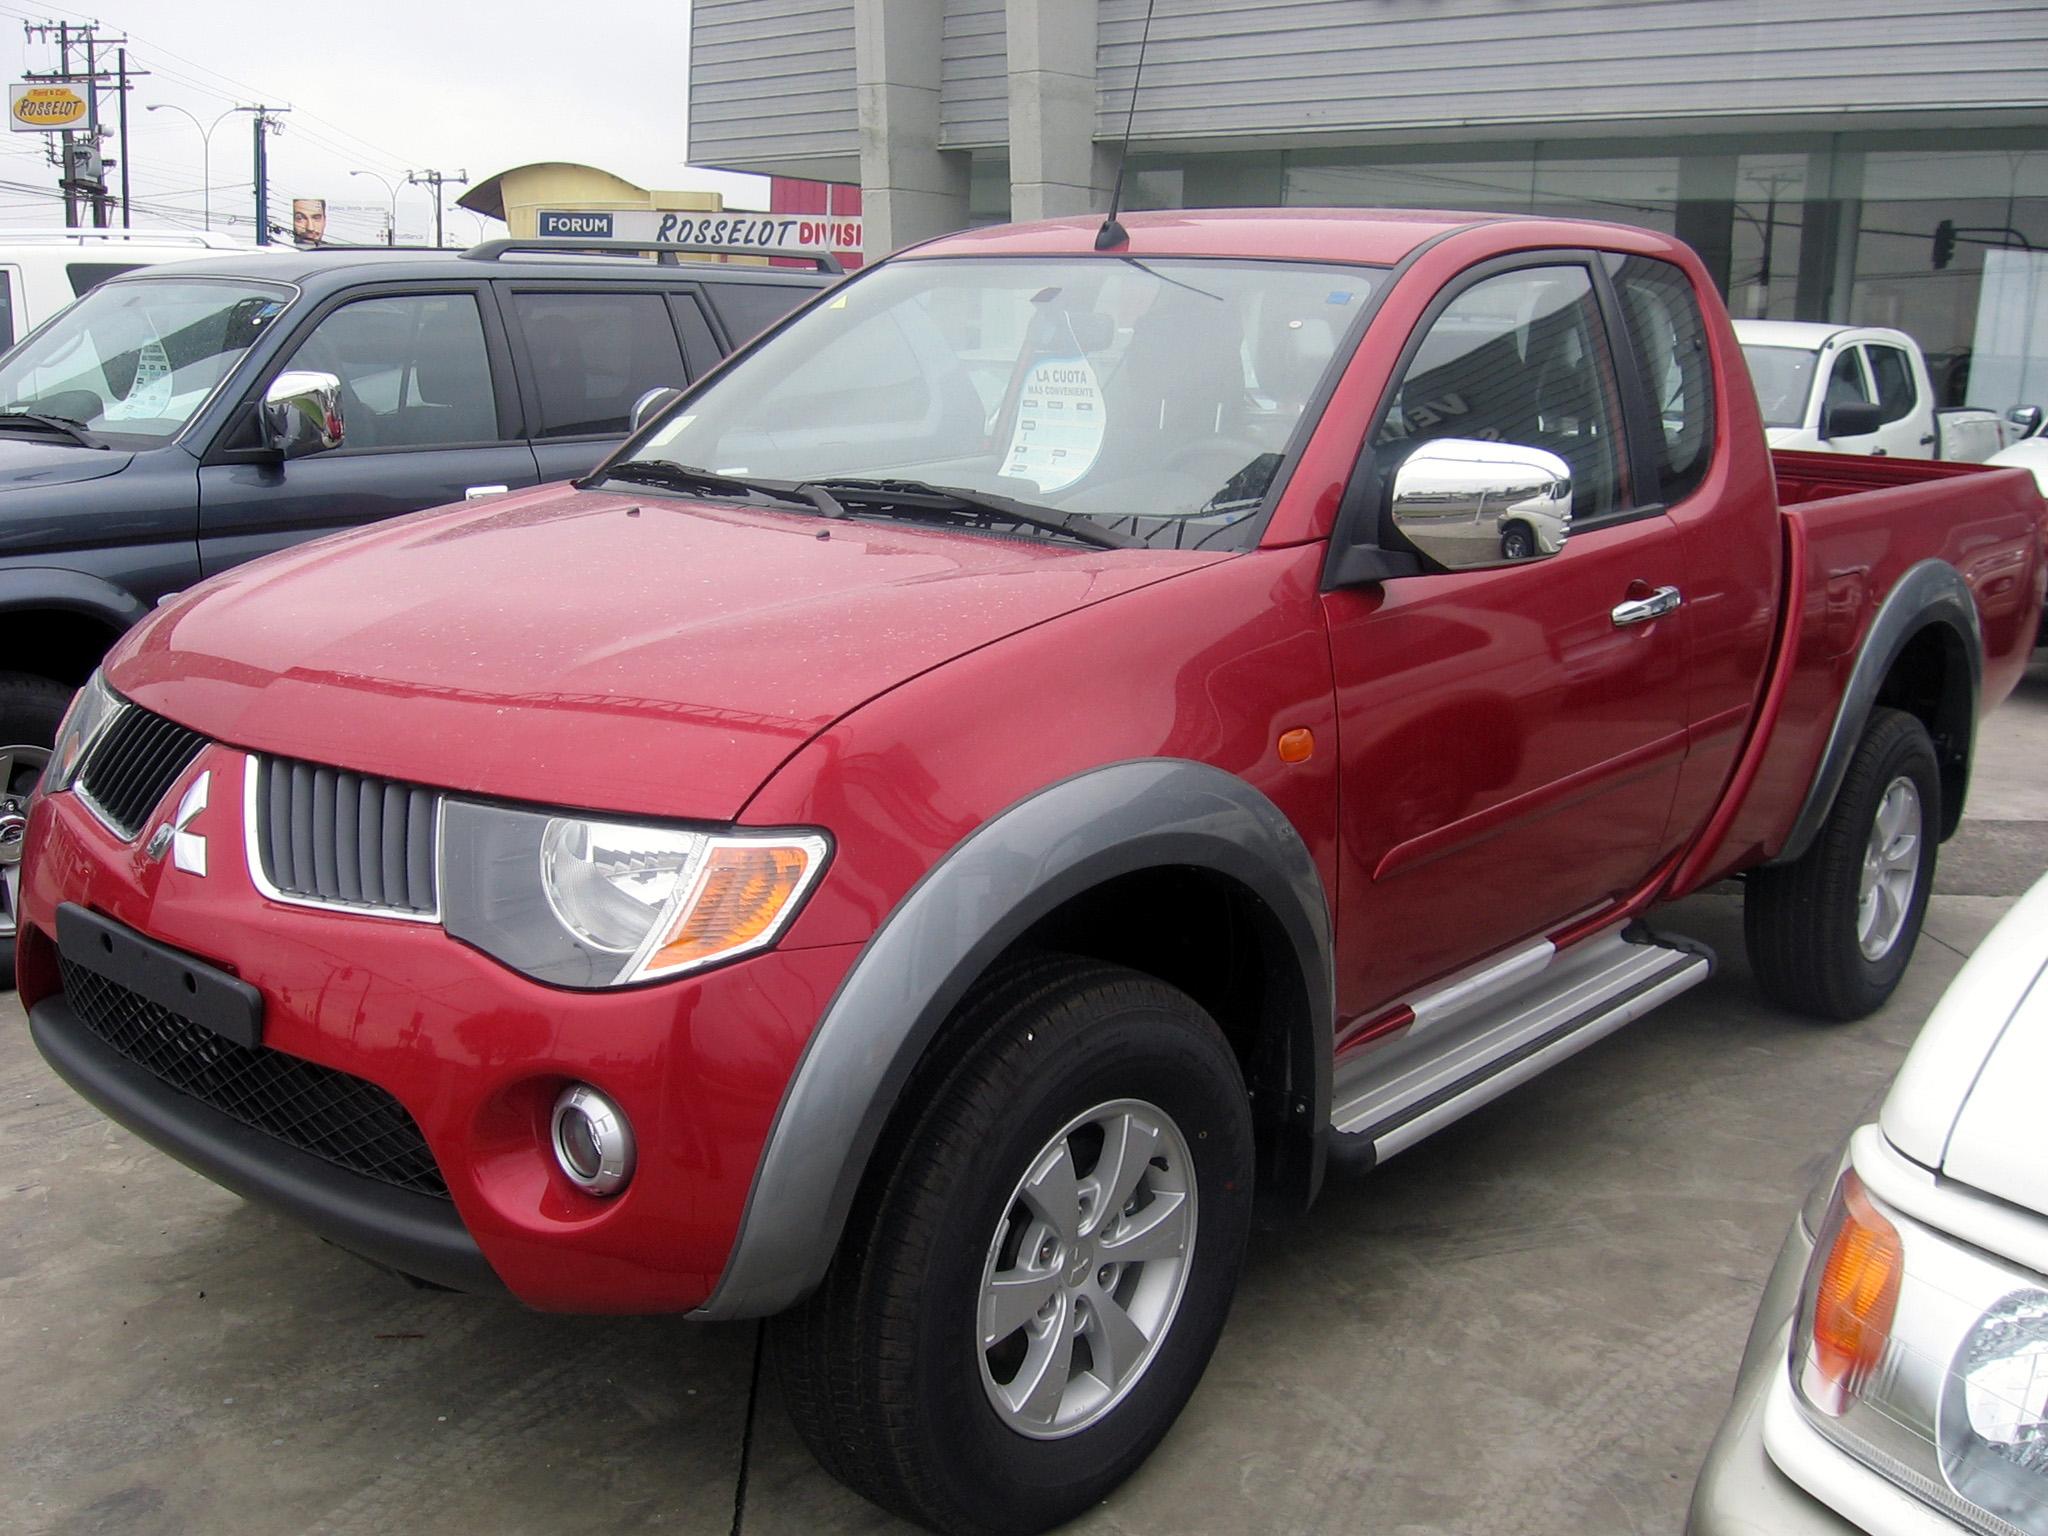 File:Mitsubishi L200 Dakar Club Cab 2008 (15800423742).jpg ...